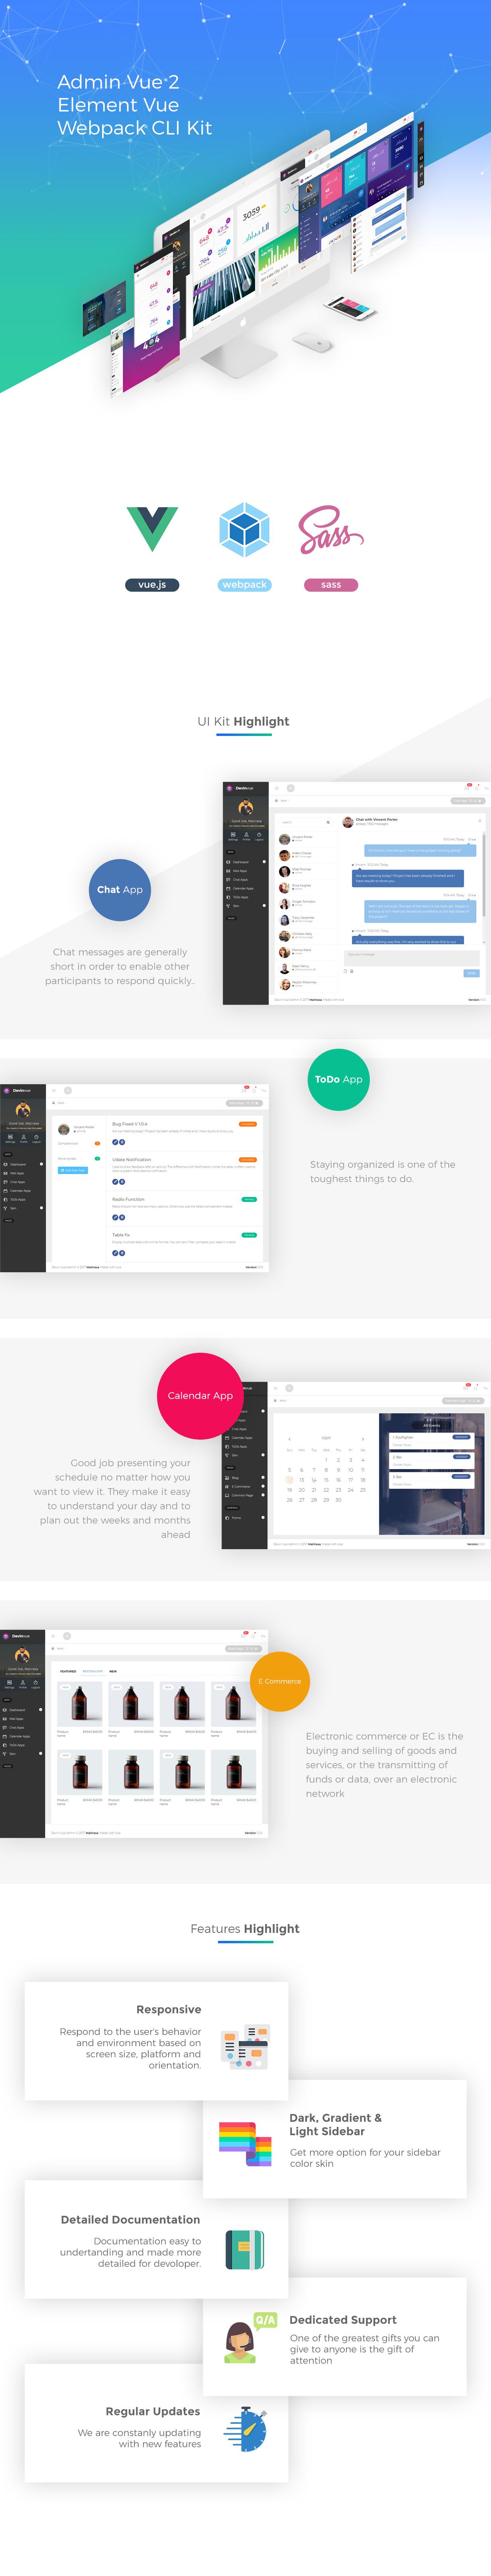 features devin 2 - Devinvue - Admin Vue 2 and Element + Vue Webpack CLI Kit